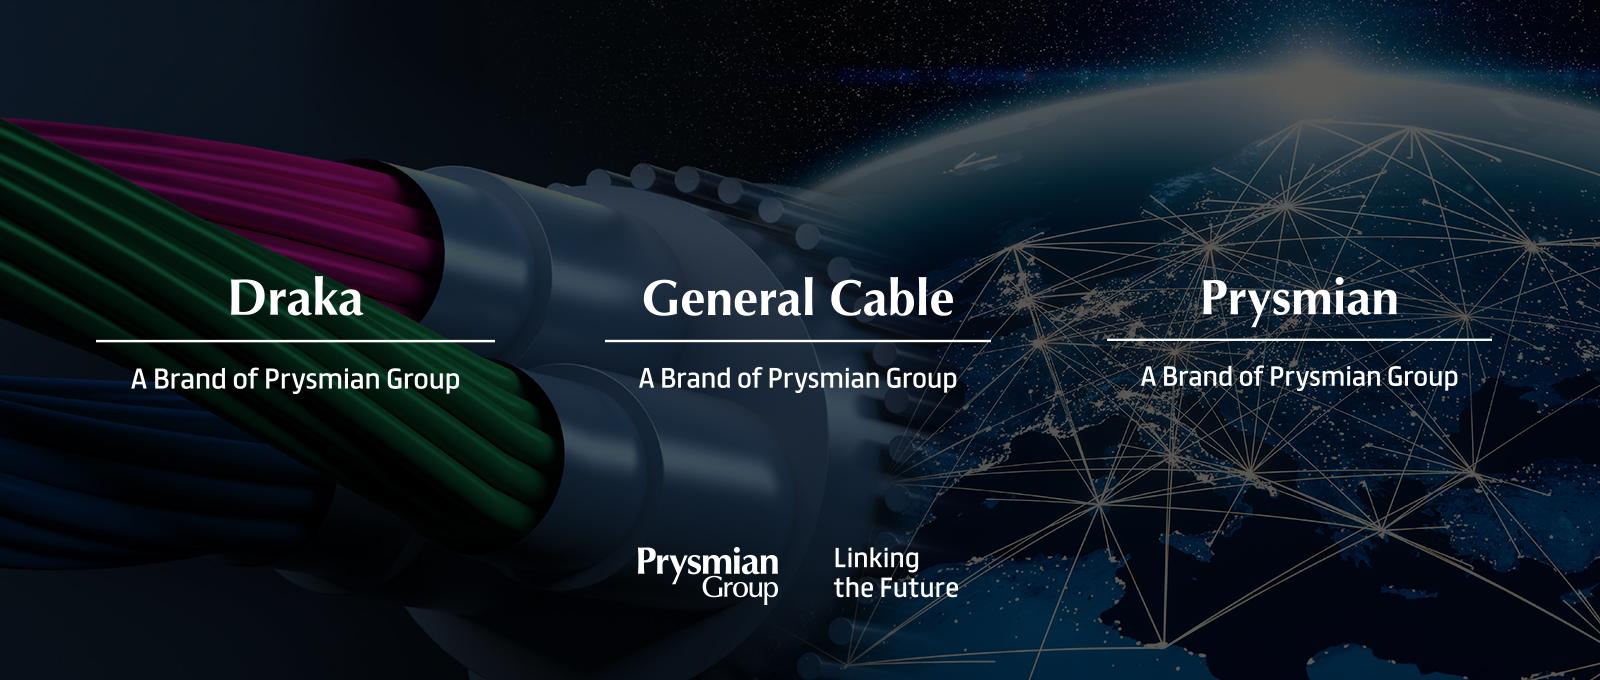 Prysmian Group completa la brand integration con General Cable